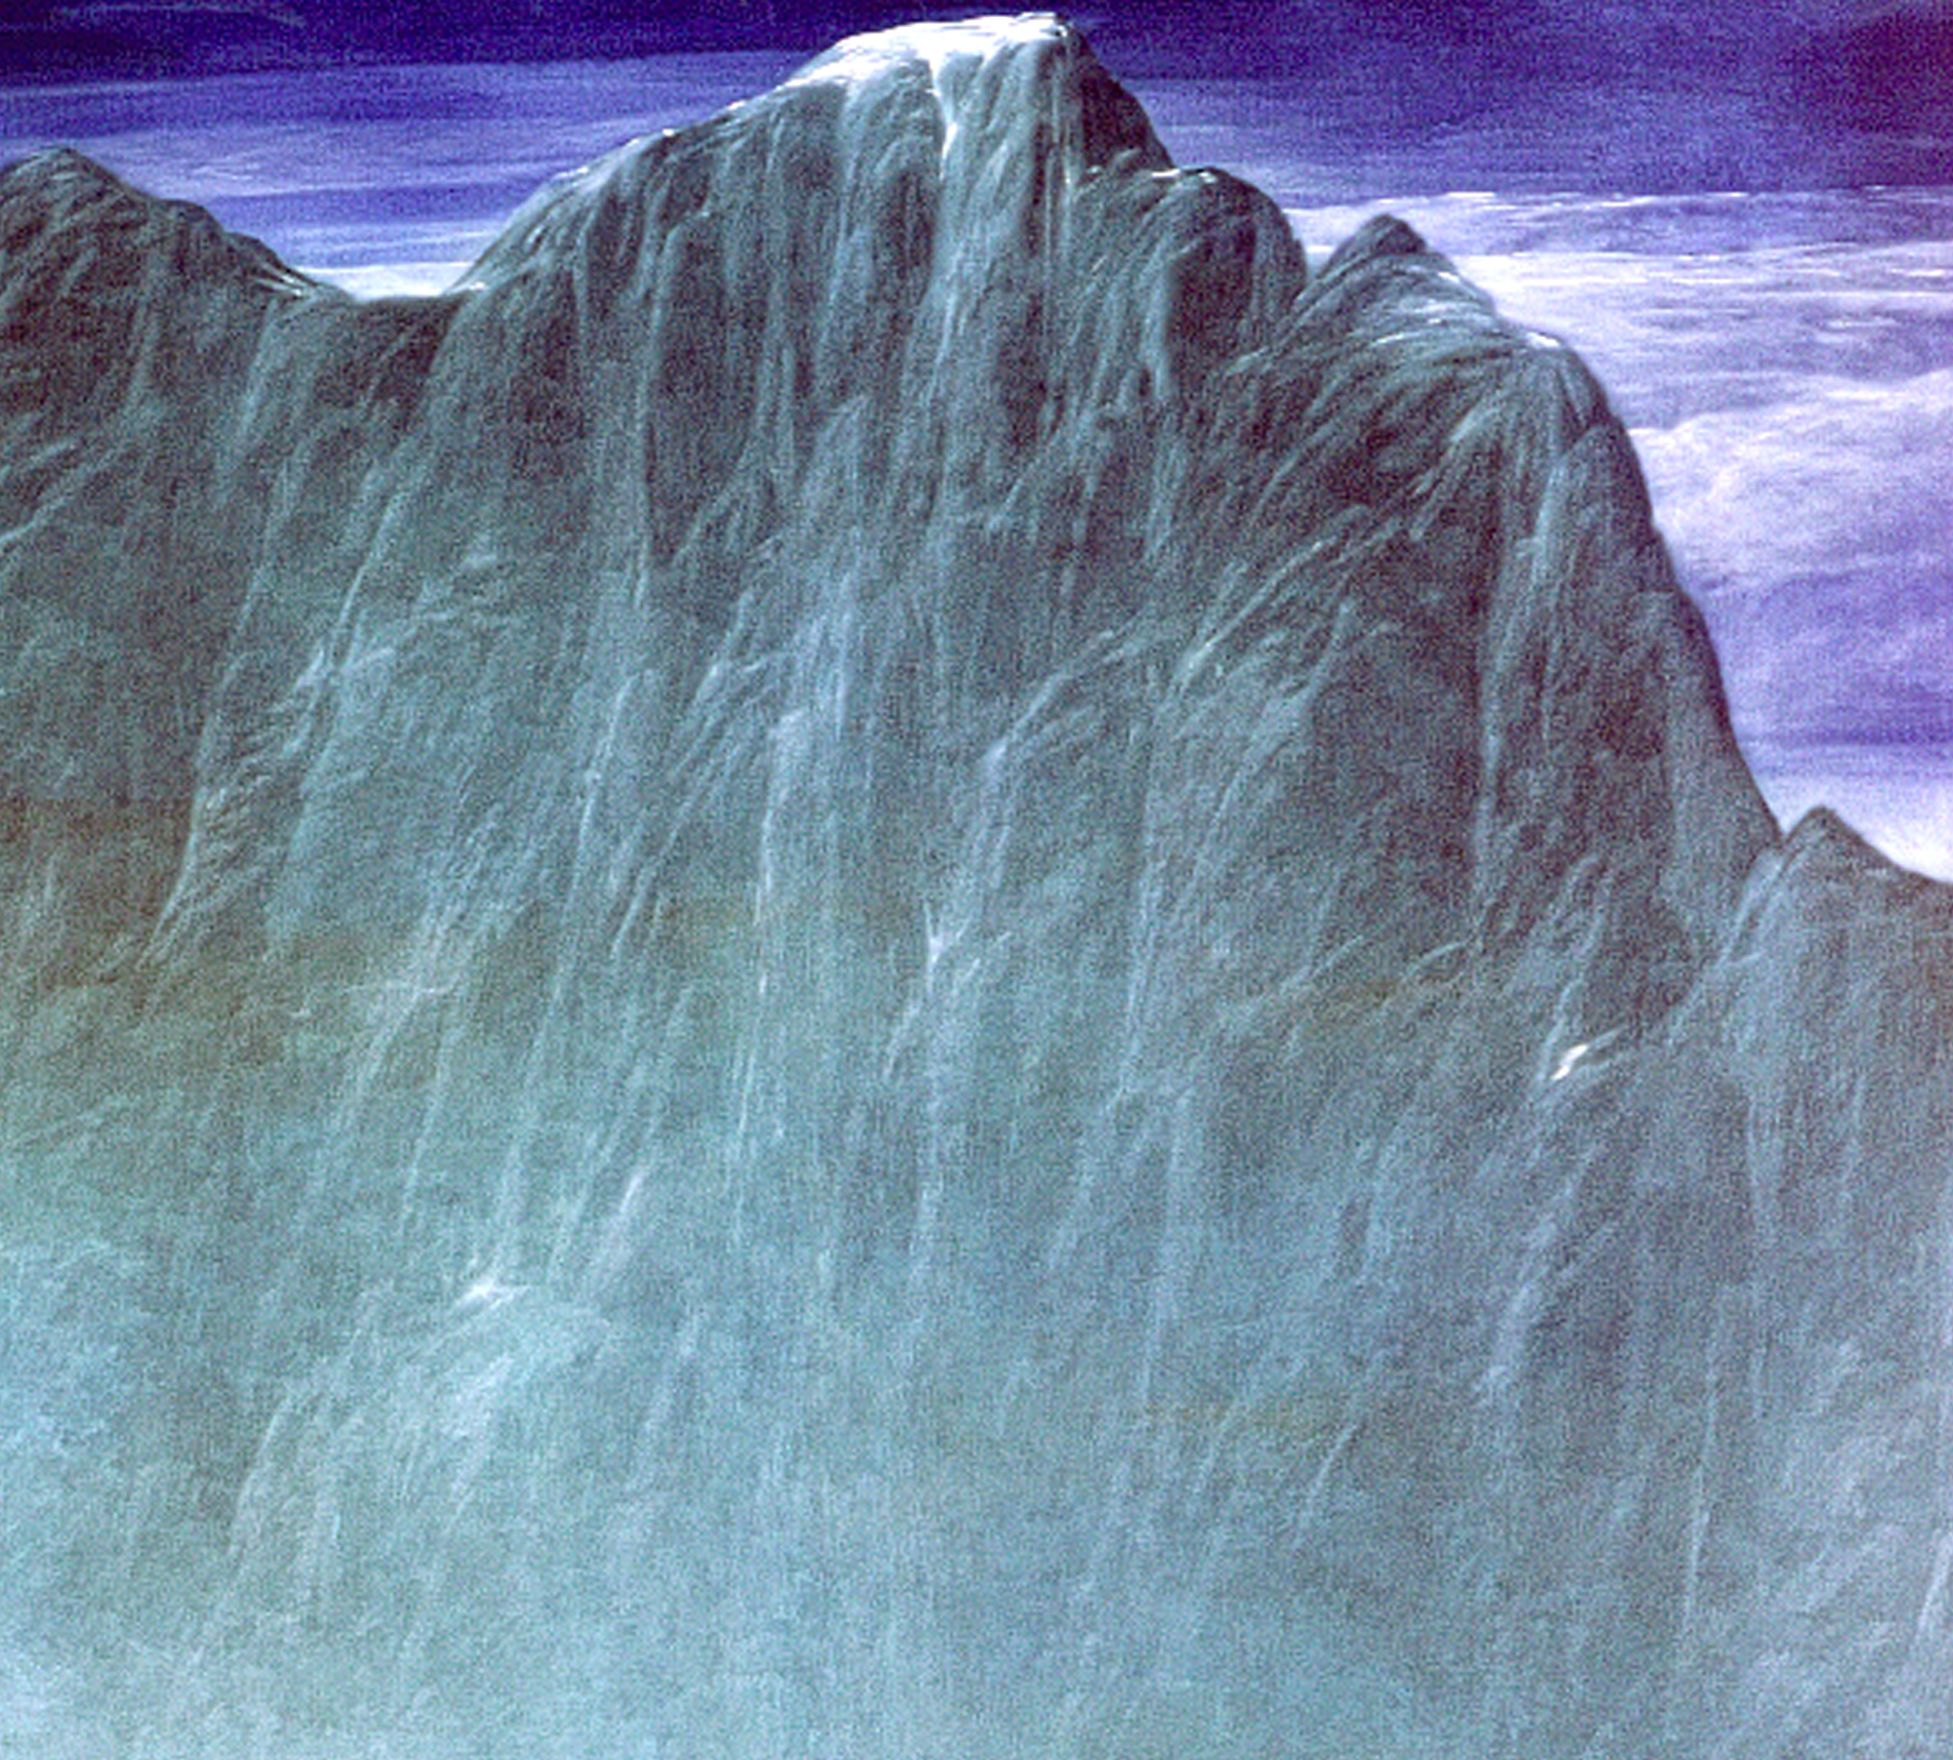 Josef Taucher, Abtragung XV, 1981, Öl/Molino, 150 x 150 cm © Josef Taucher